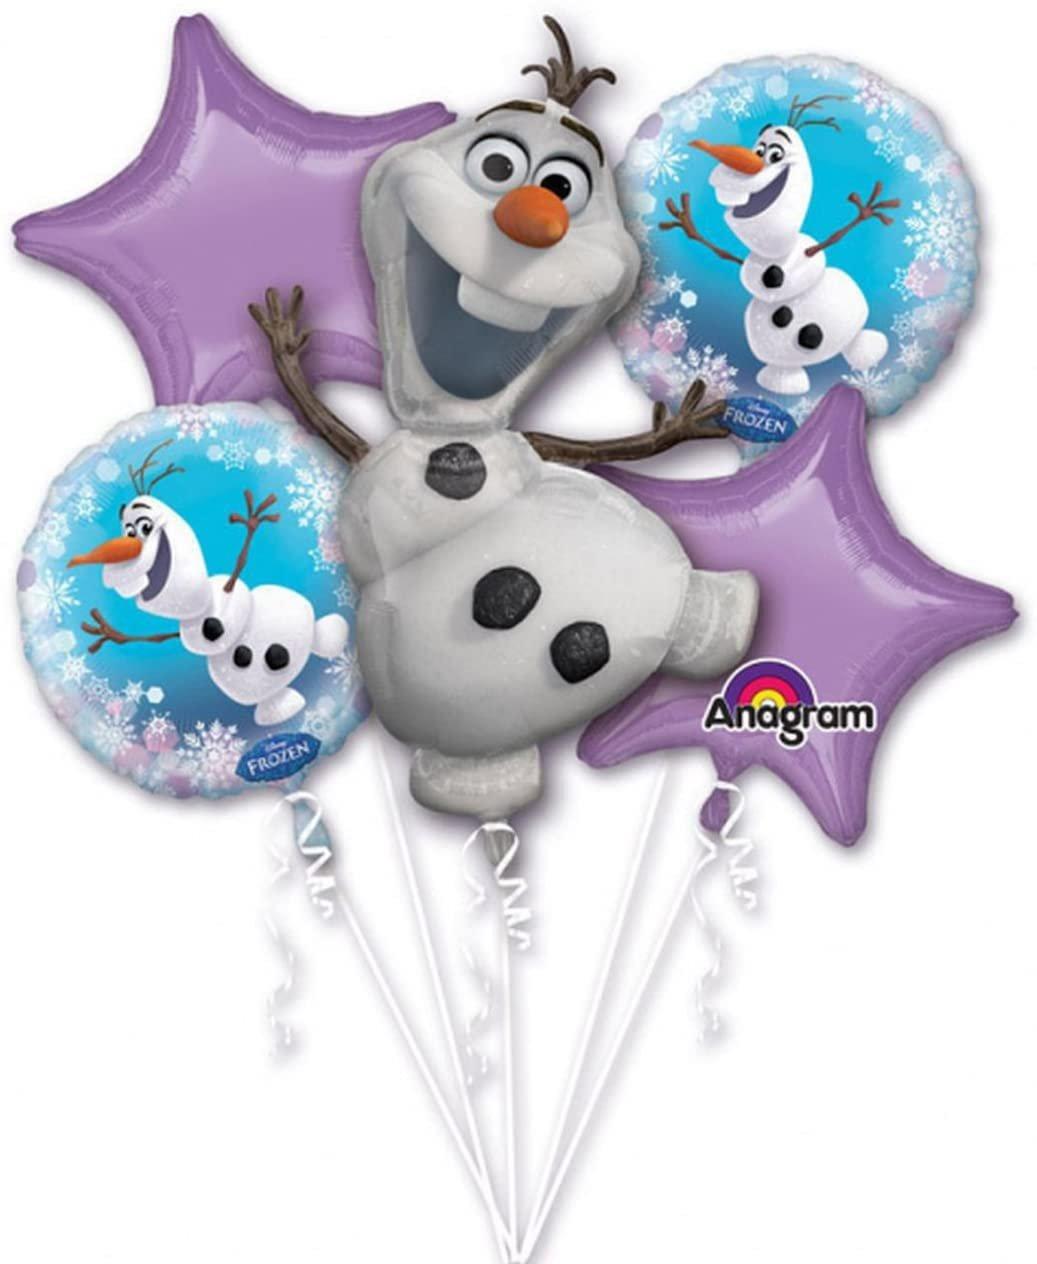 Frozen Olaf Bouquet Balloon